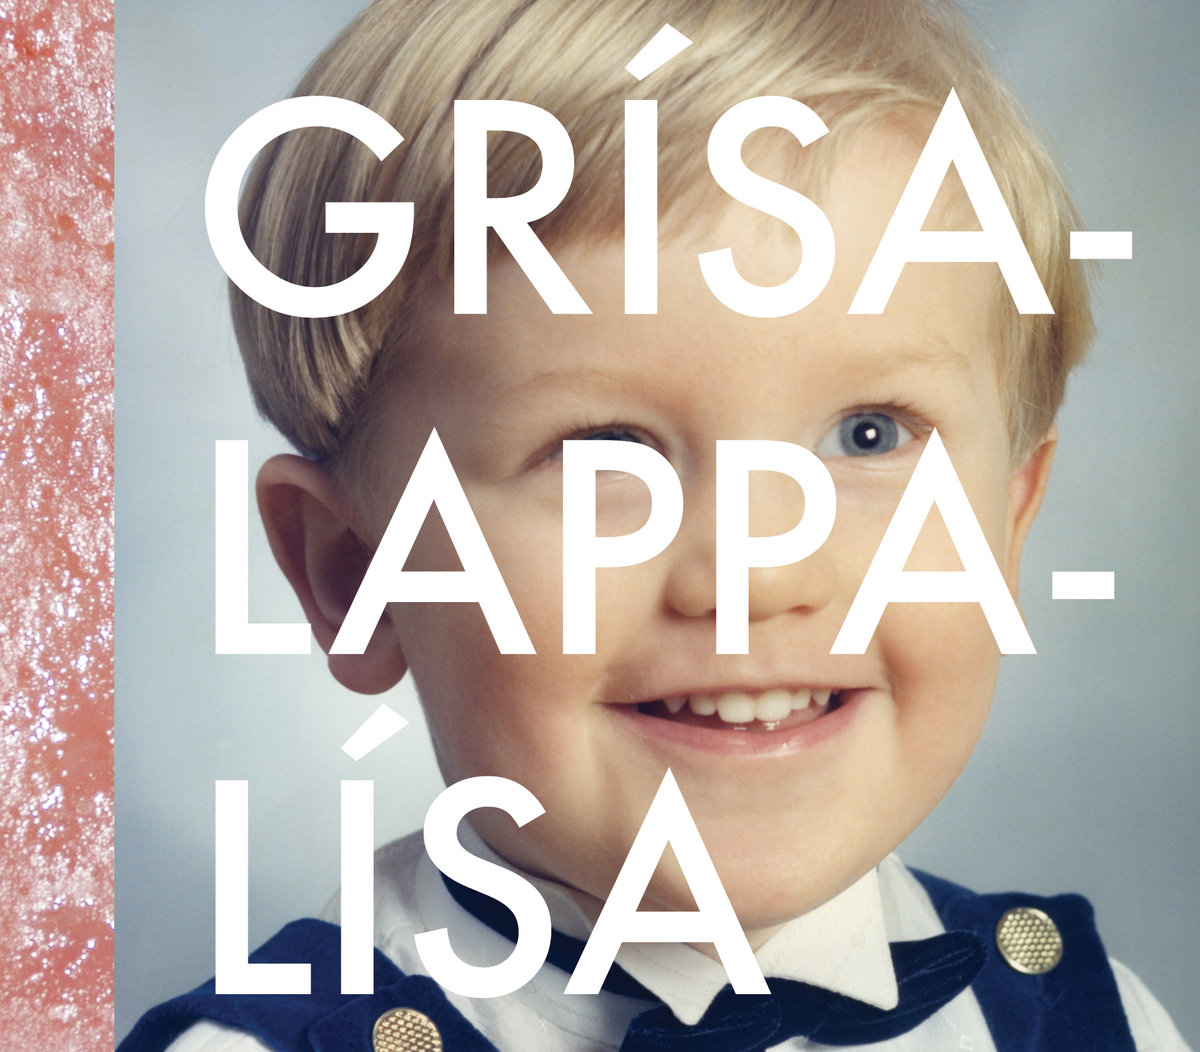 Grísalappalísa - Ali (2013)  // production, engineering & mixing